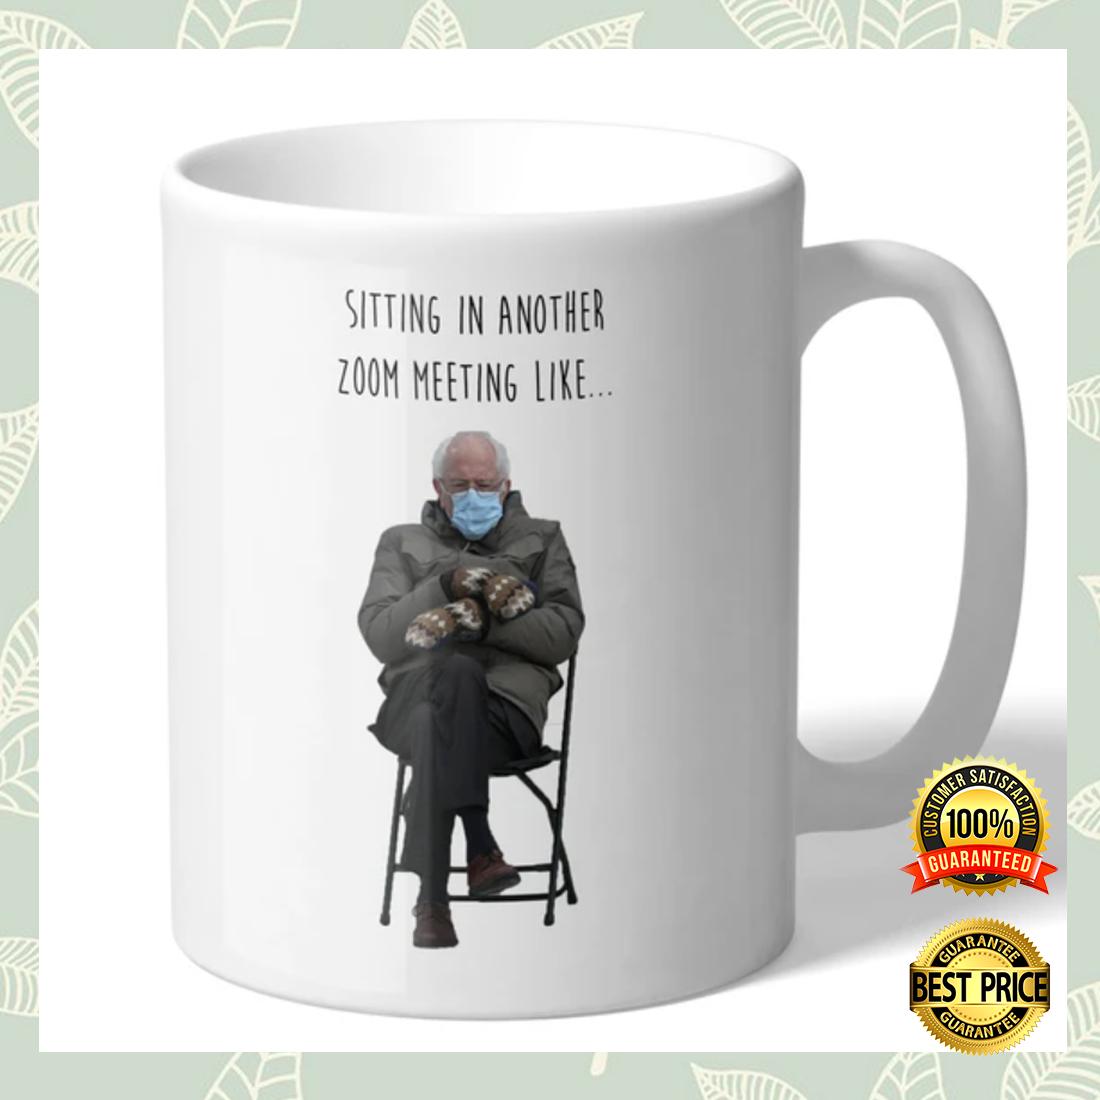 Bernie sitting in another zoom meeting like mug 4